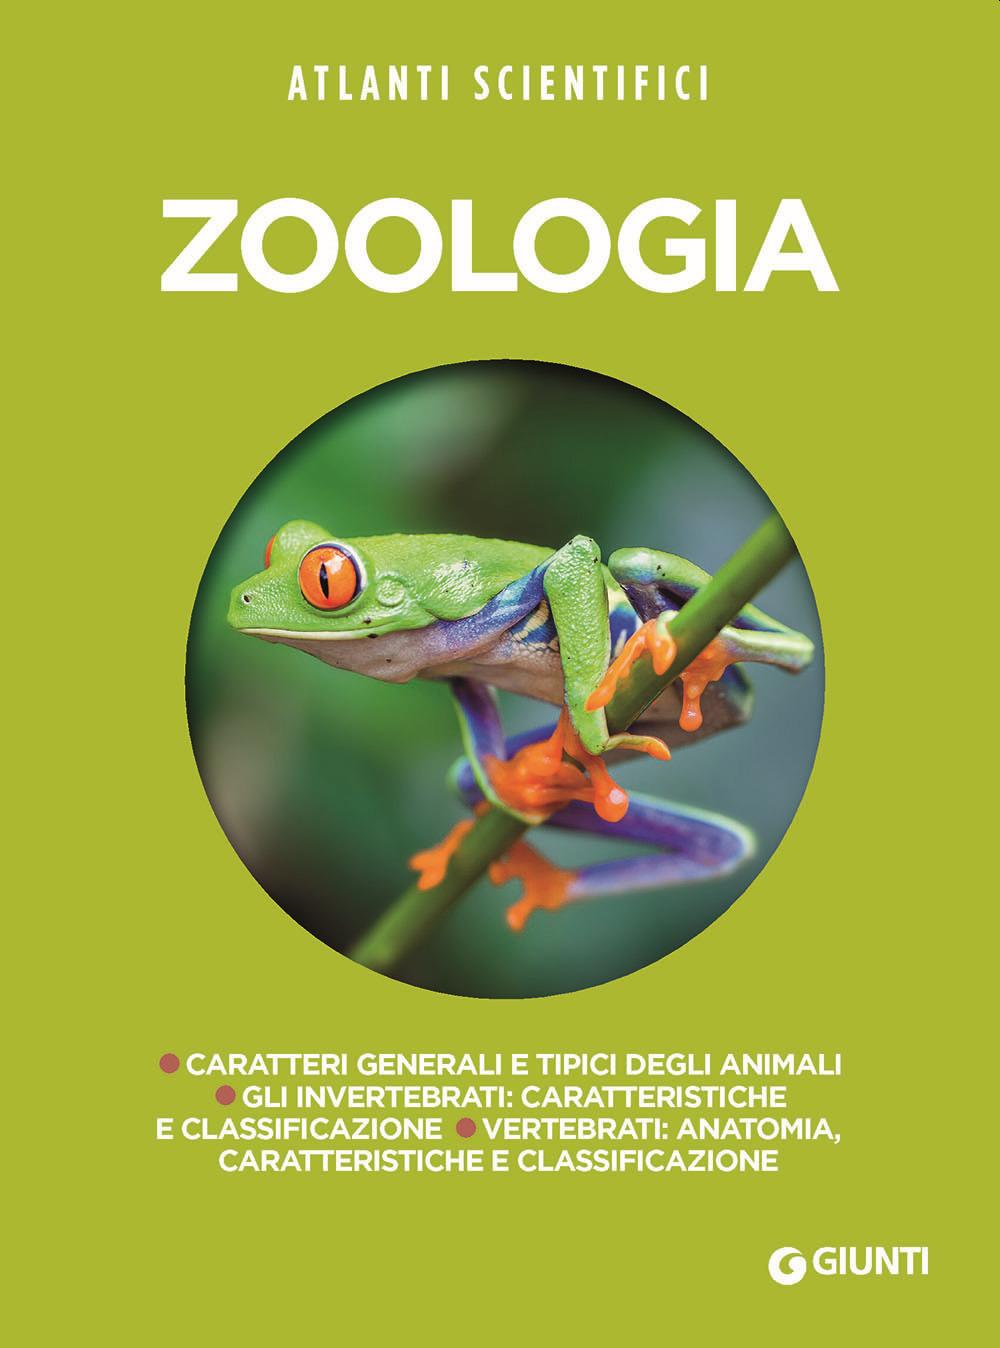 Image of Zoologia